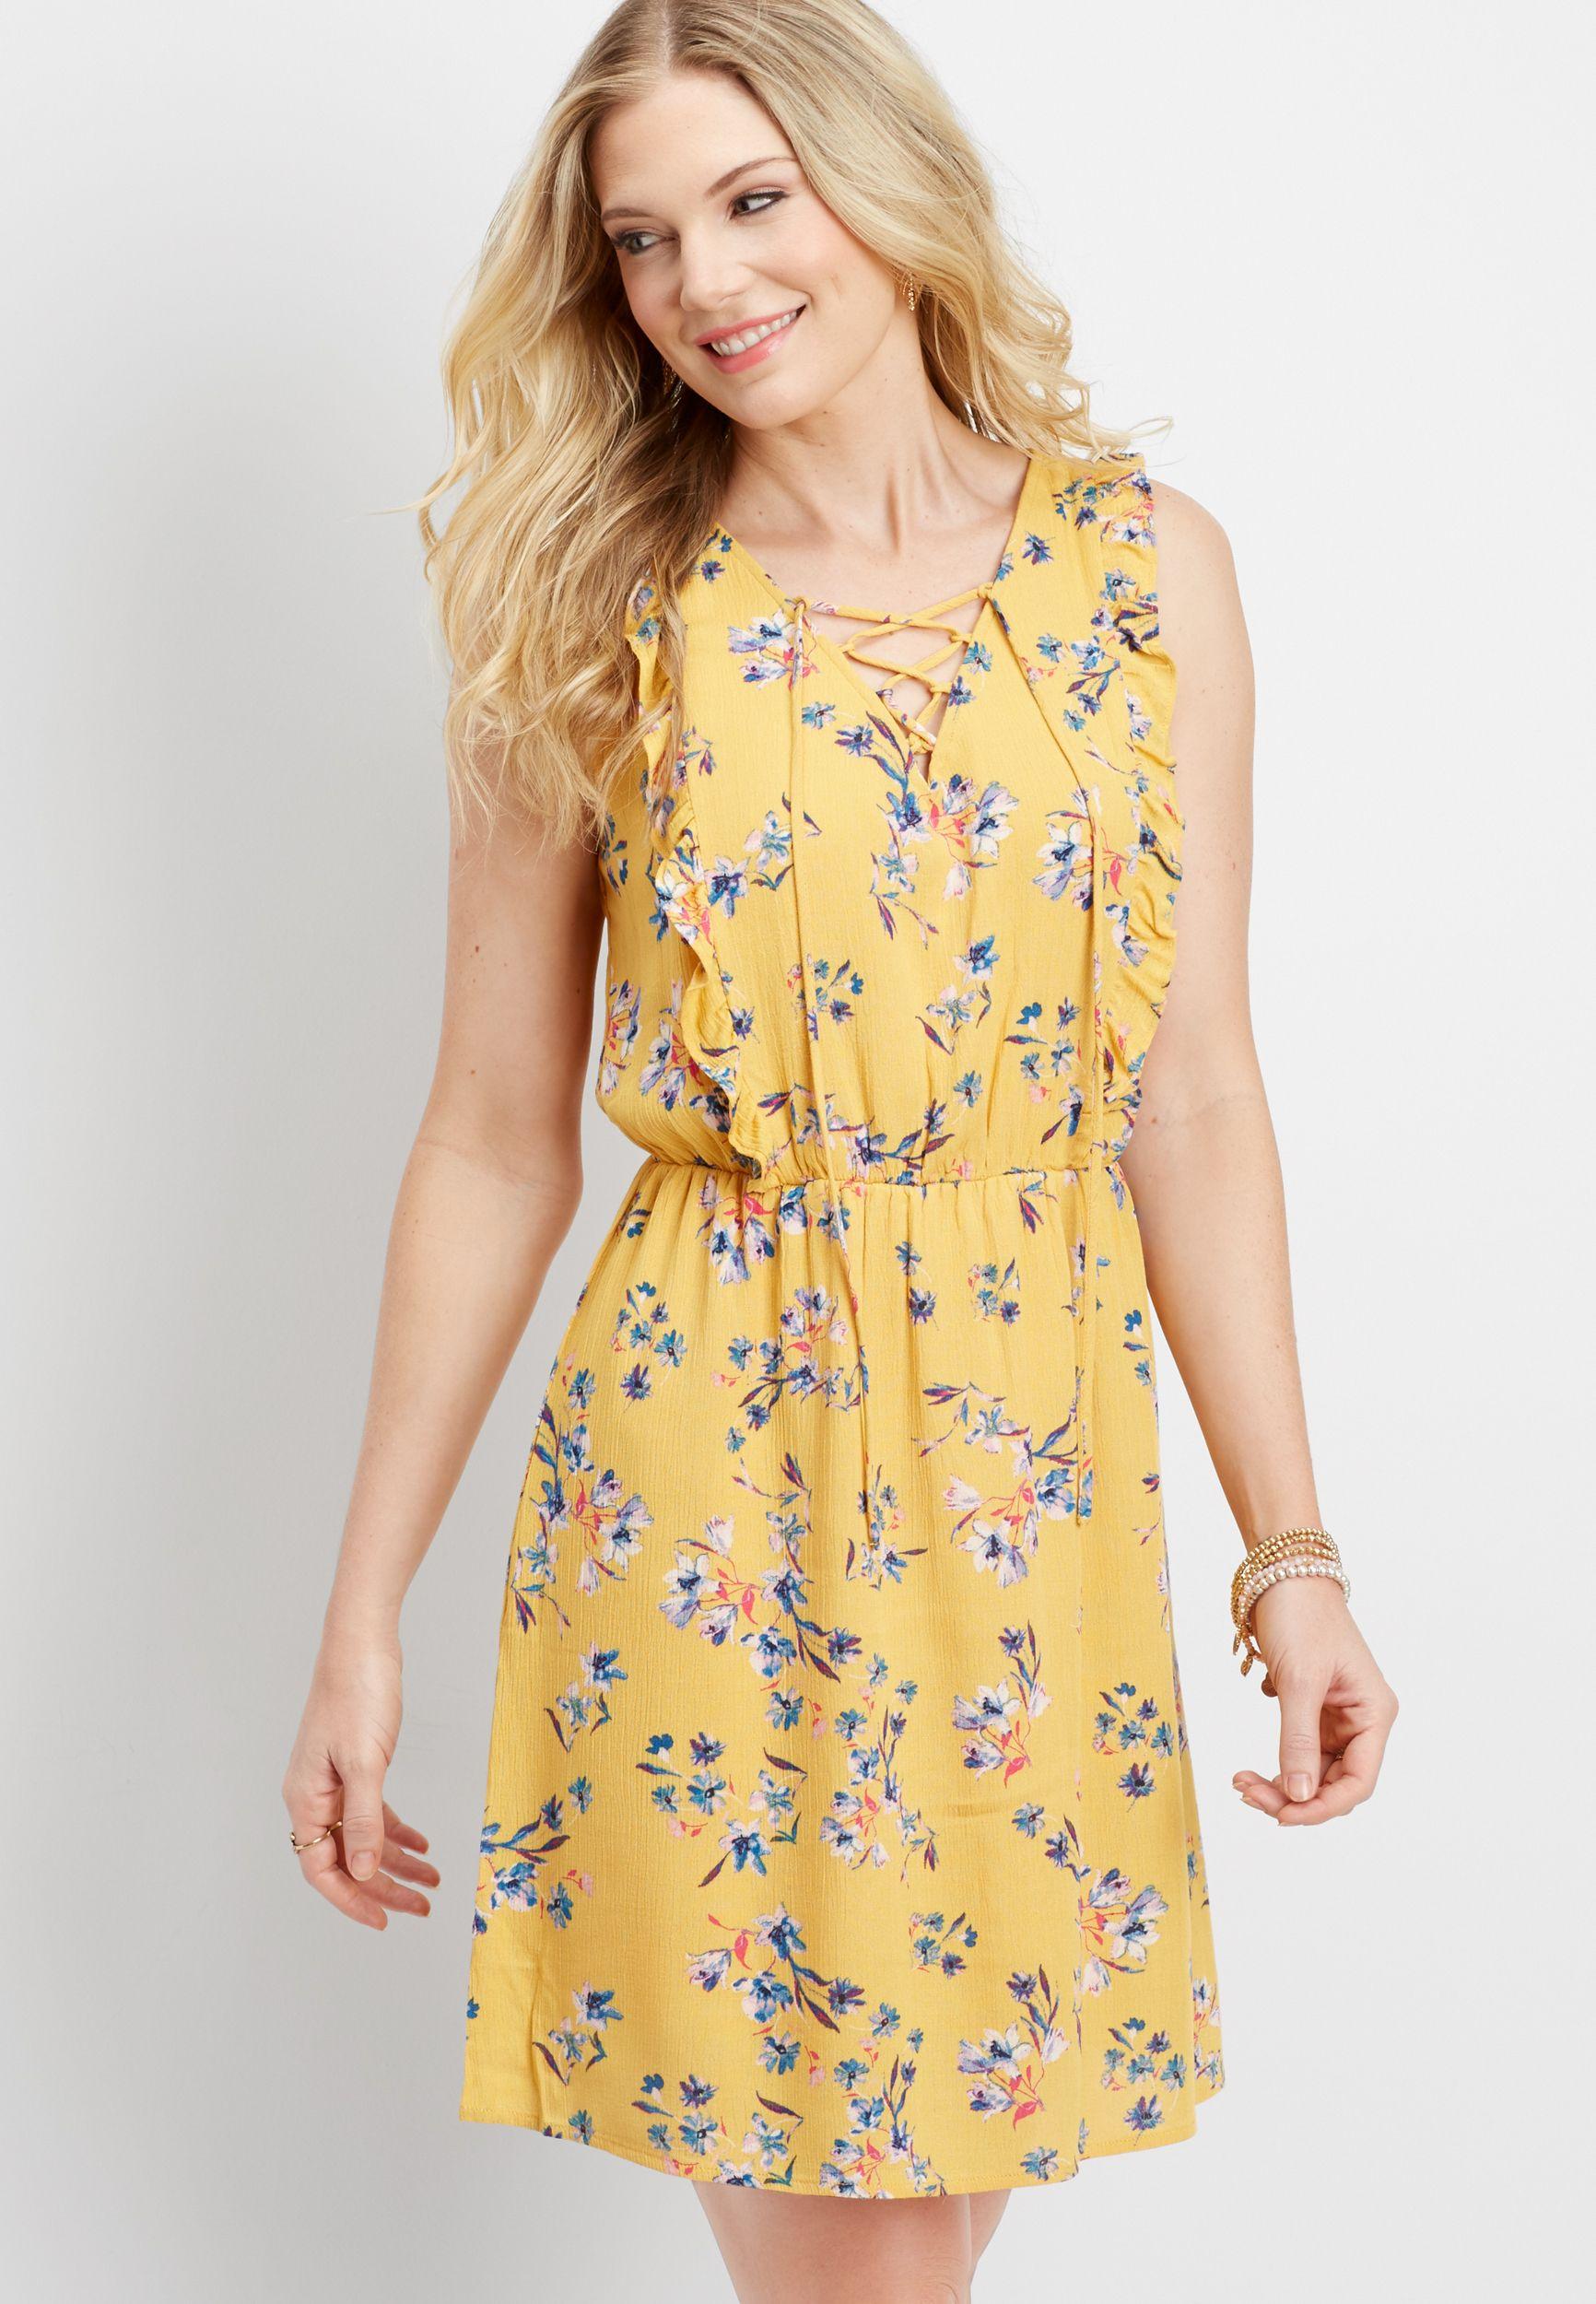 1edbfe6c3 lace up ruffle front floral dress (original price